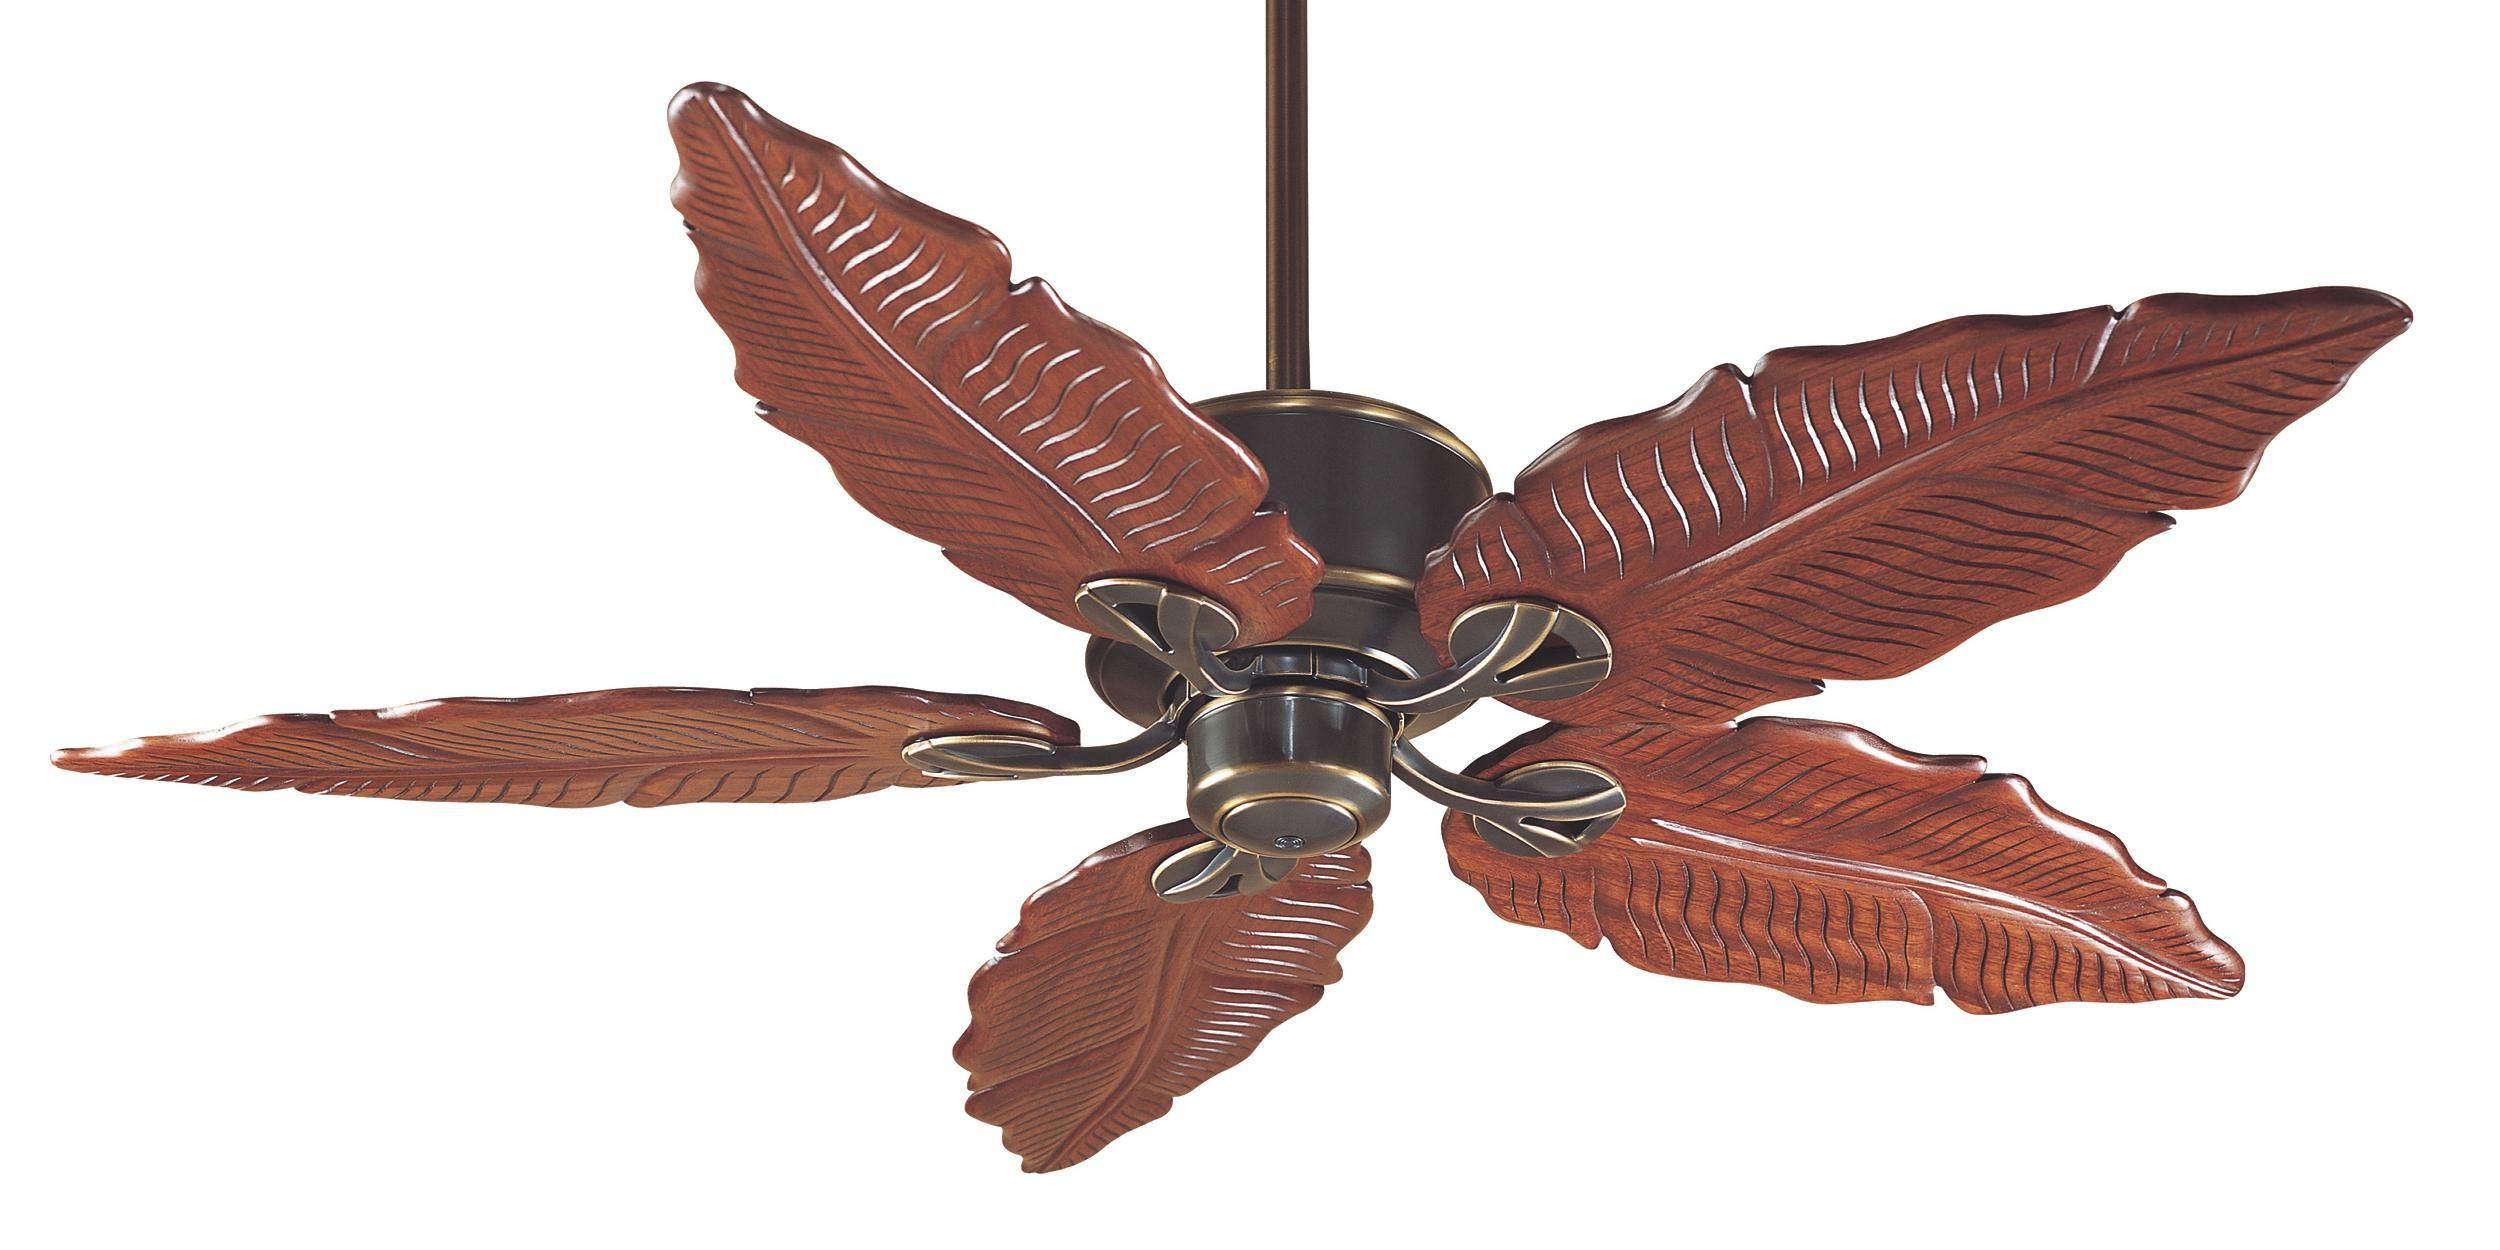 Ceiling fans hunter coronado banana leaf ceiling fan 28522 in ceiling fans hunter coronado banana leaf ceiling fan 28522 in amber bronze aloadofball Image collections